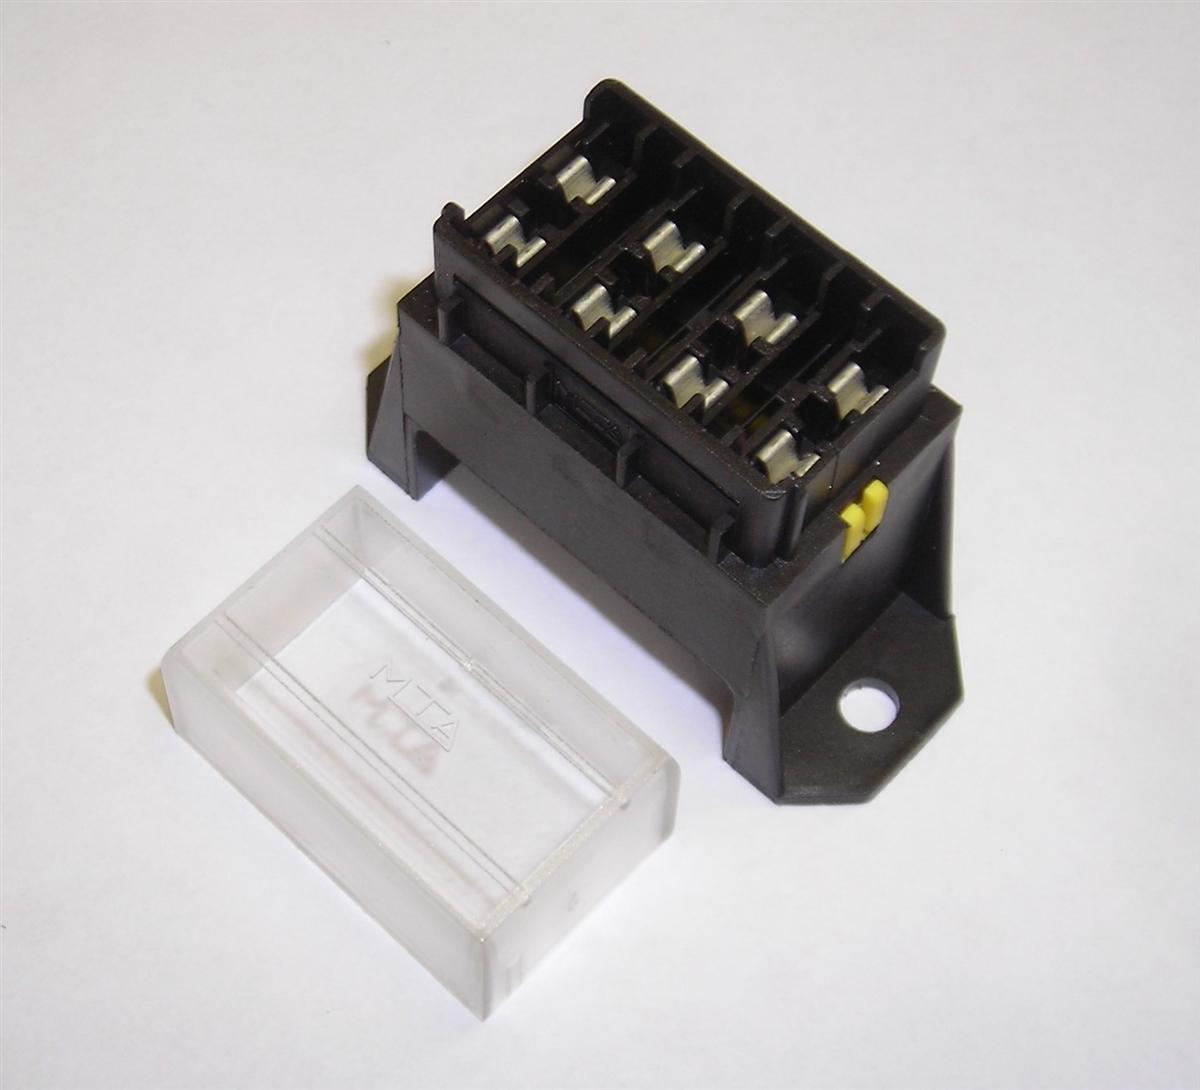 4-Way Fusebox for Blade FusesBritish Wiring